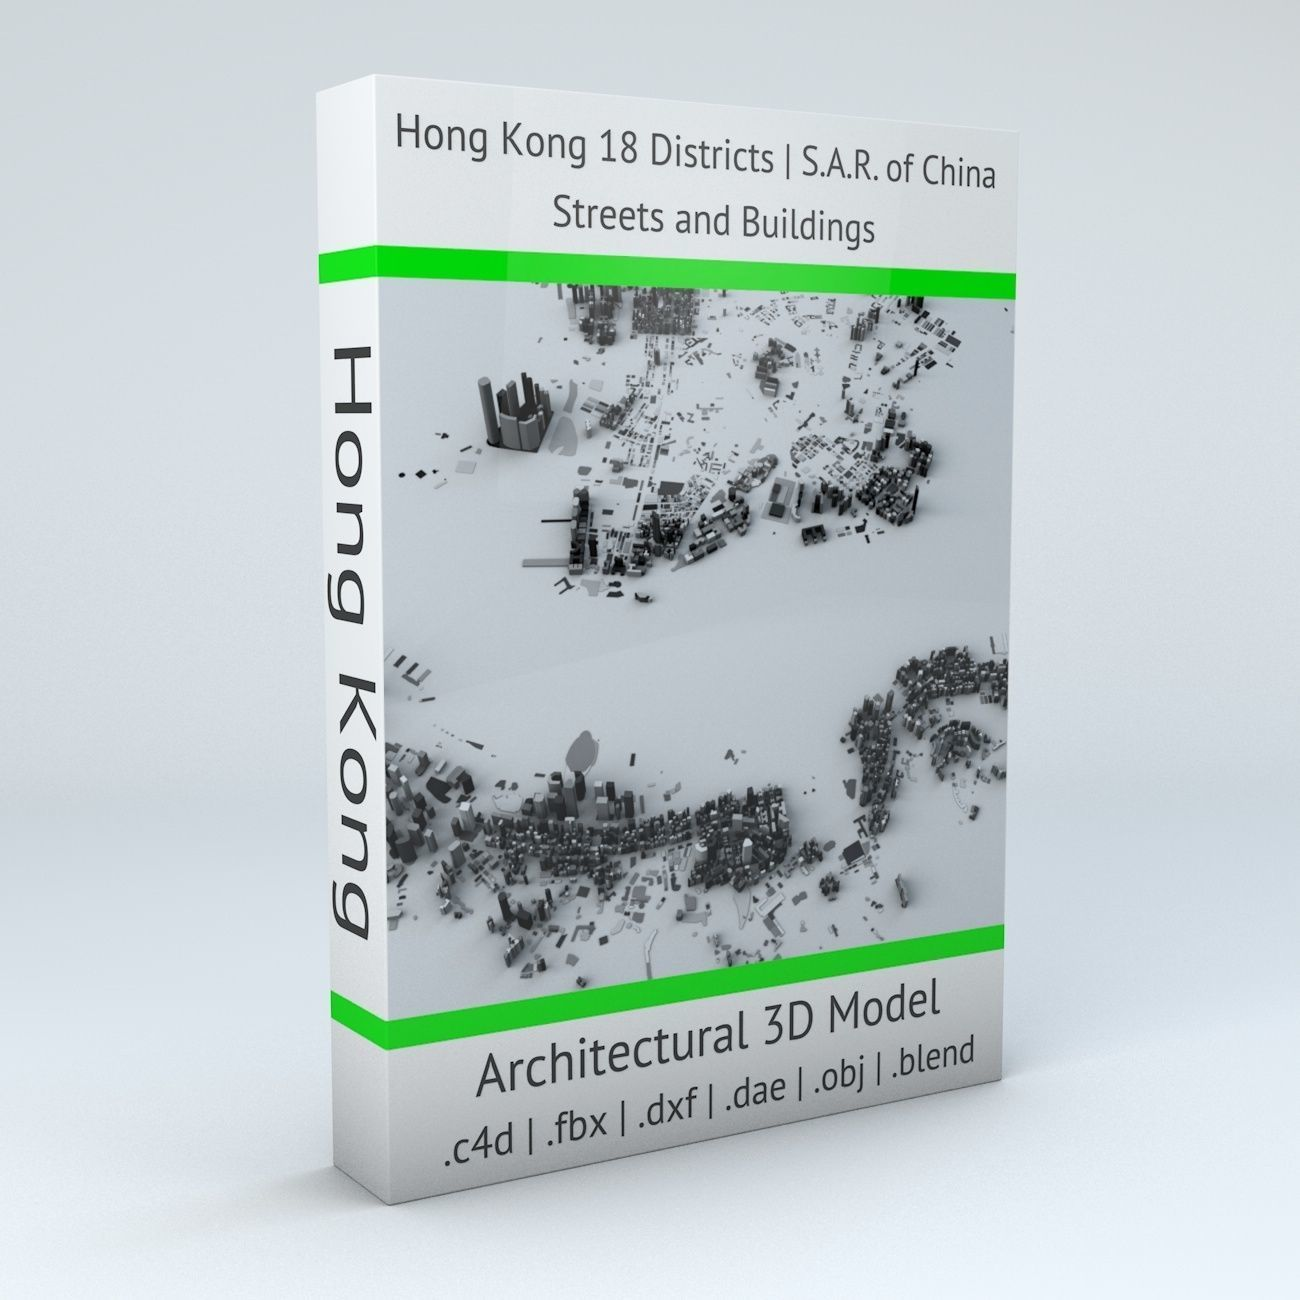 Hong Kong 18 Districts Streets and Buildings